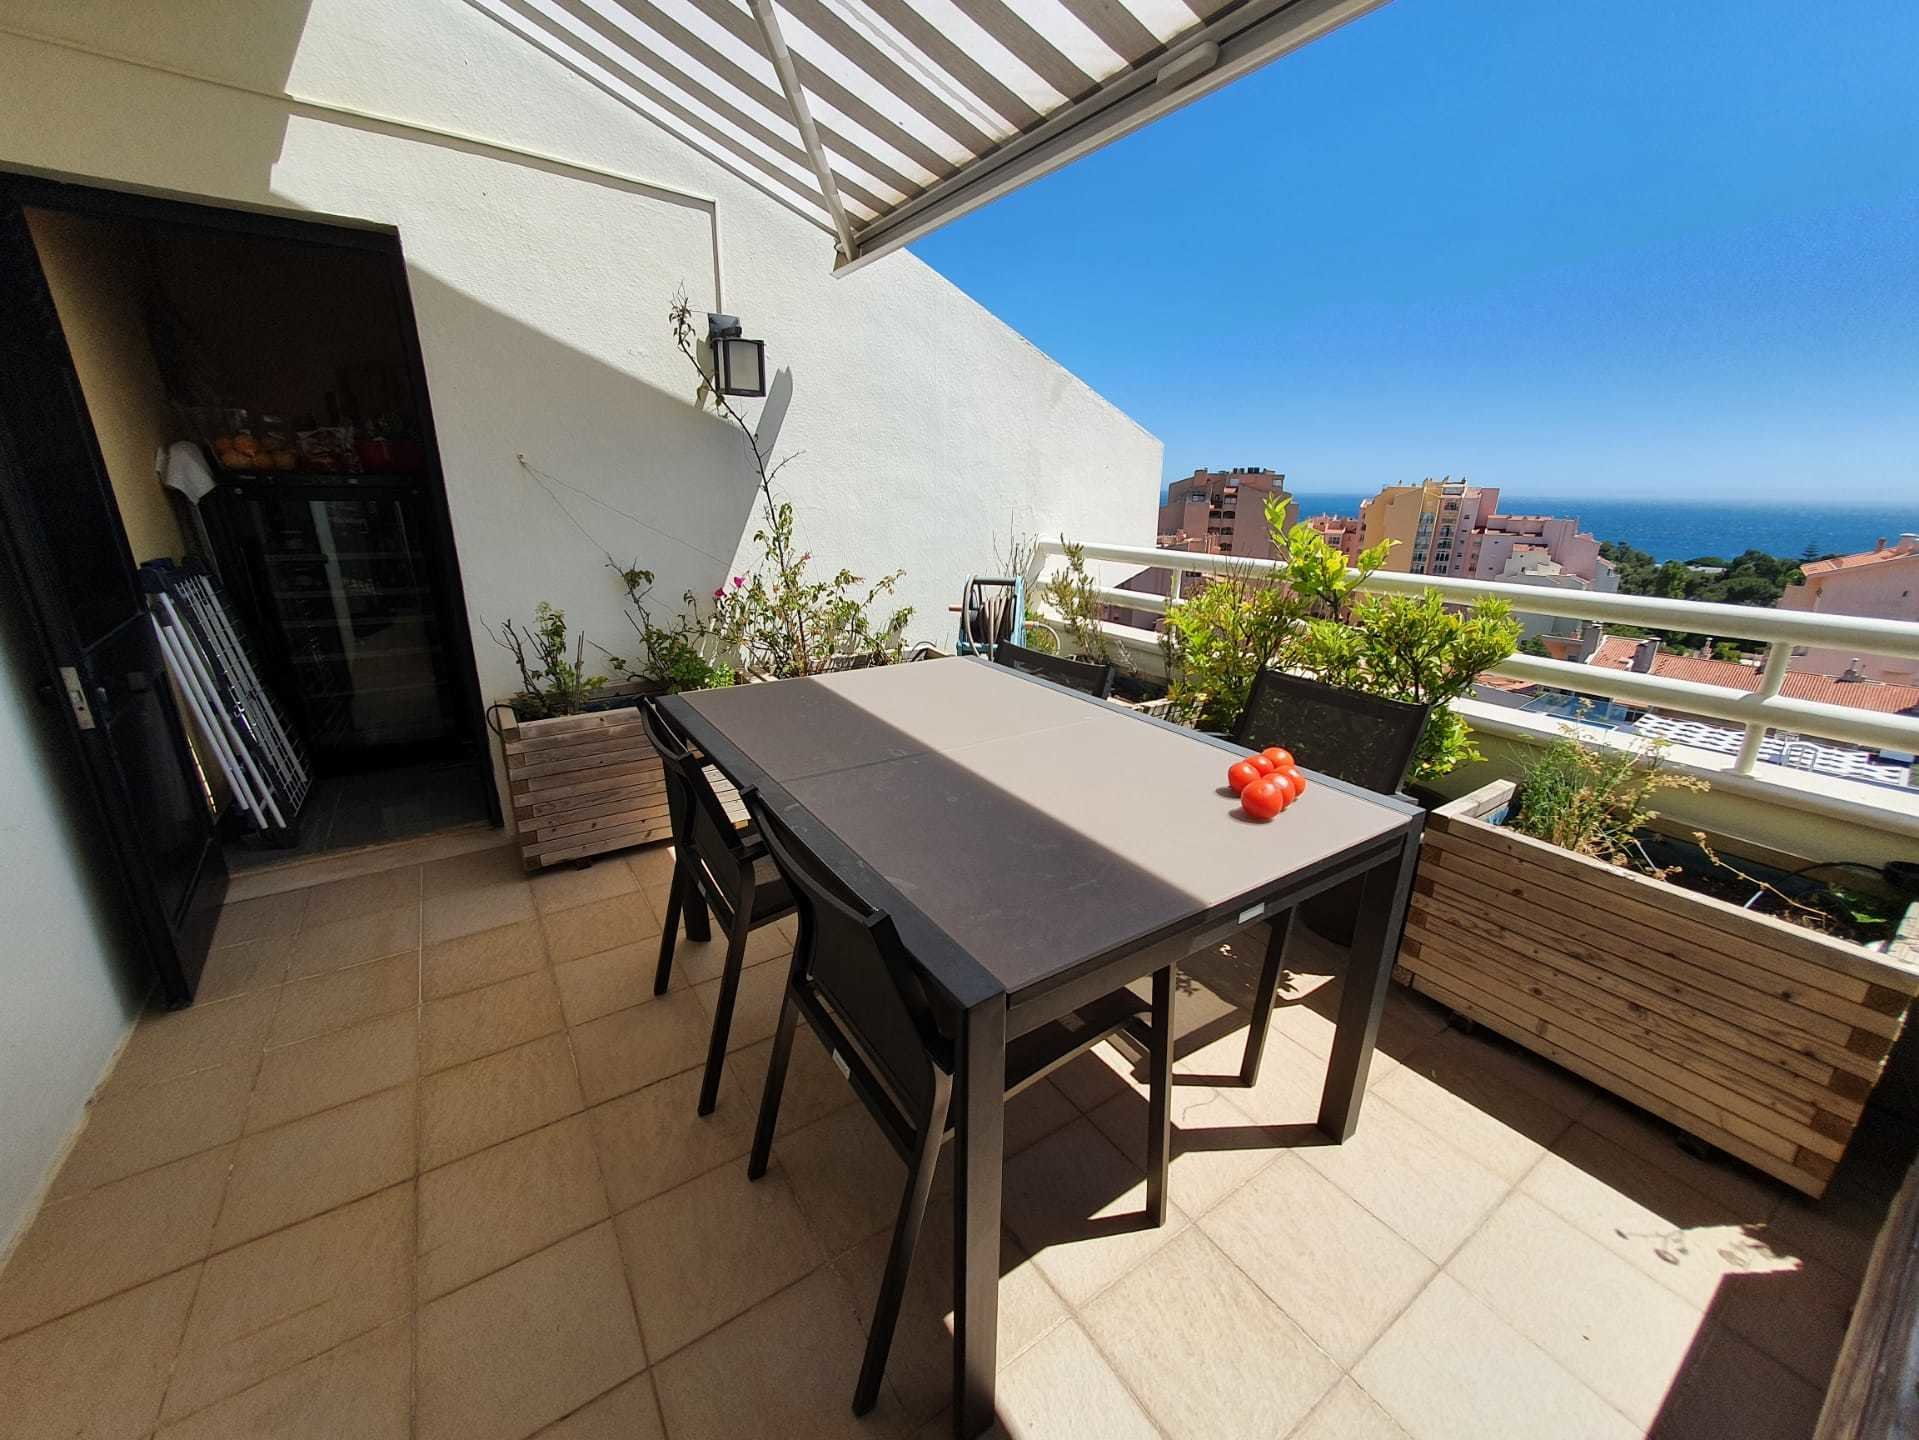 2 Bedroom Penthouse Cascais, Lisbon Ref: AAI353